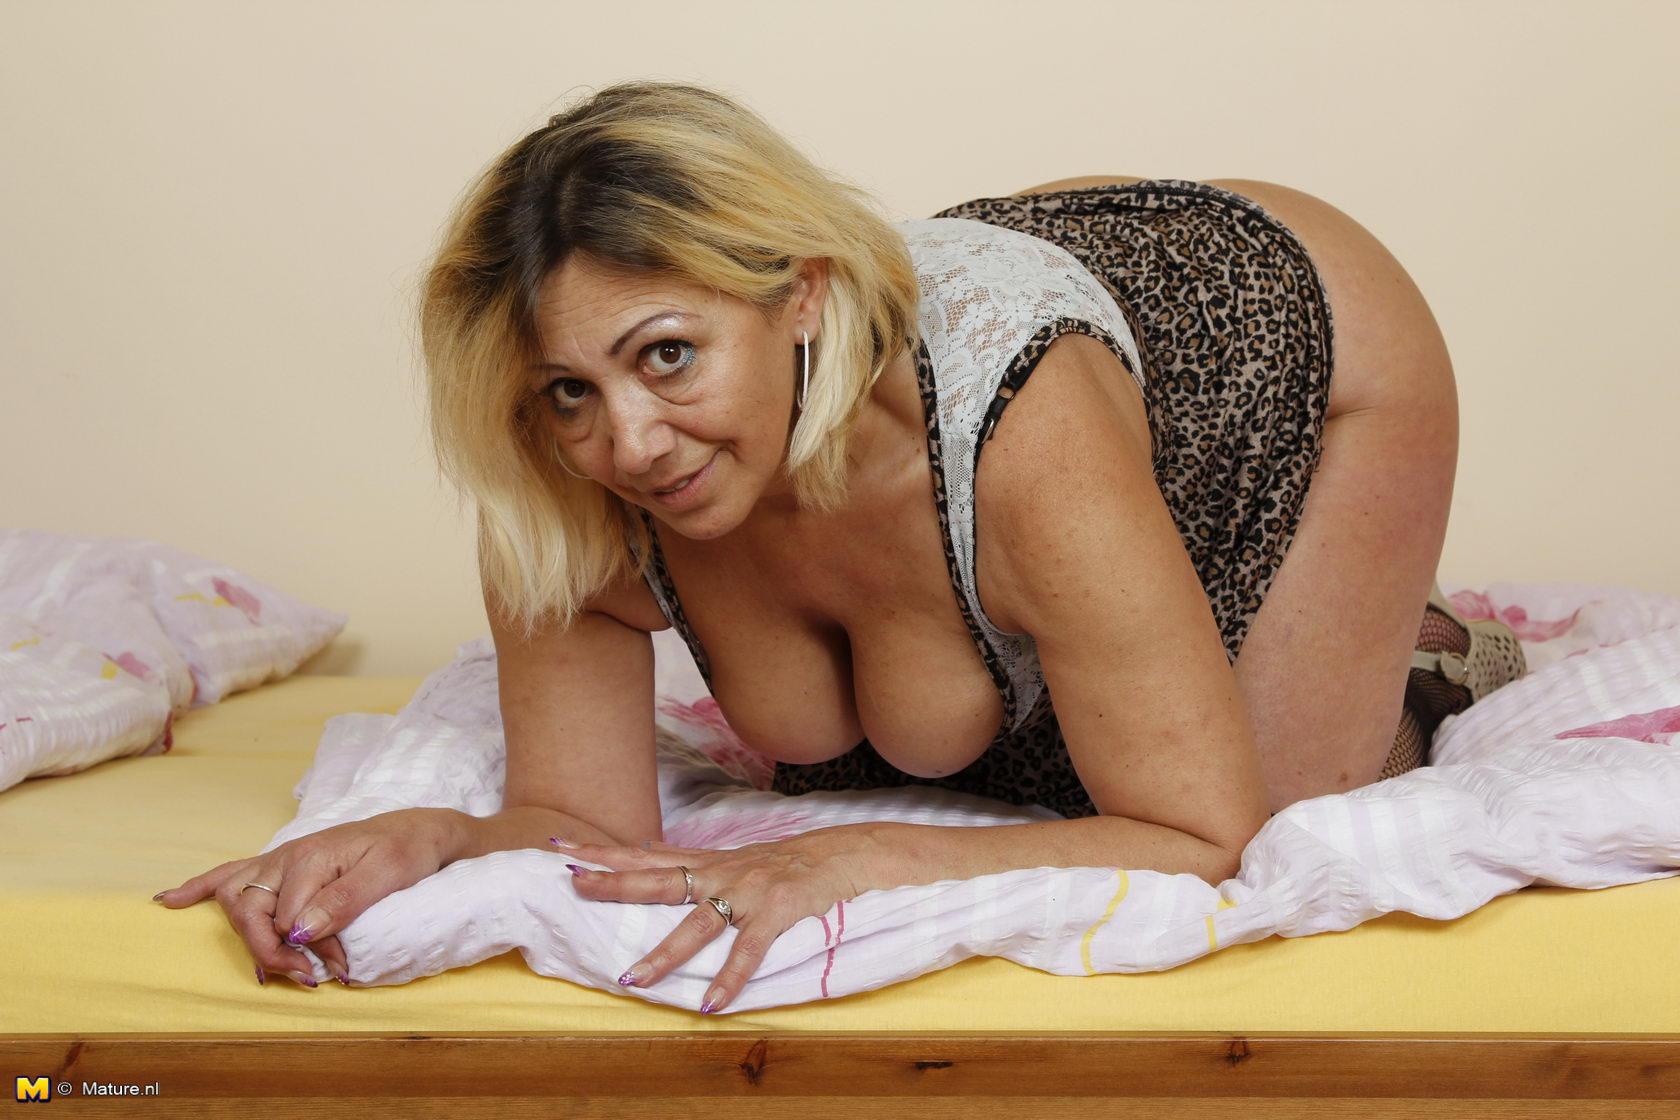 jennifer selling her virginity